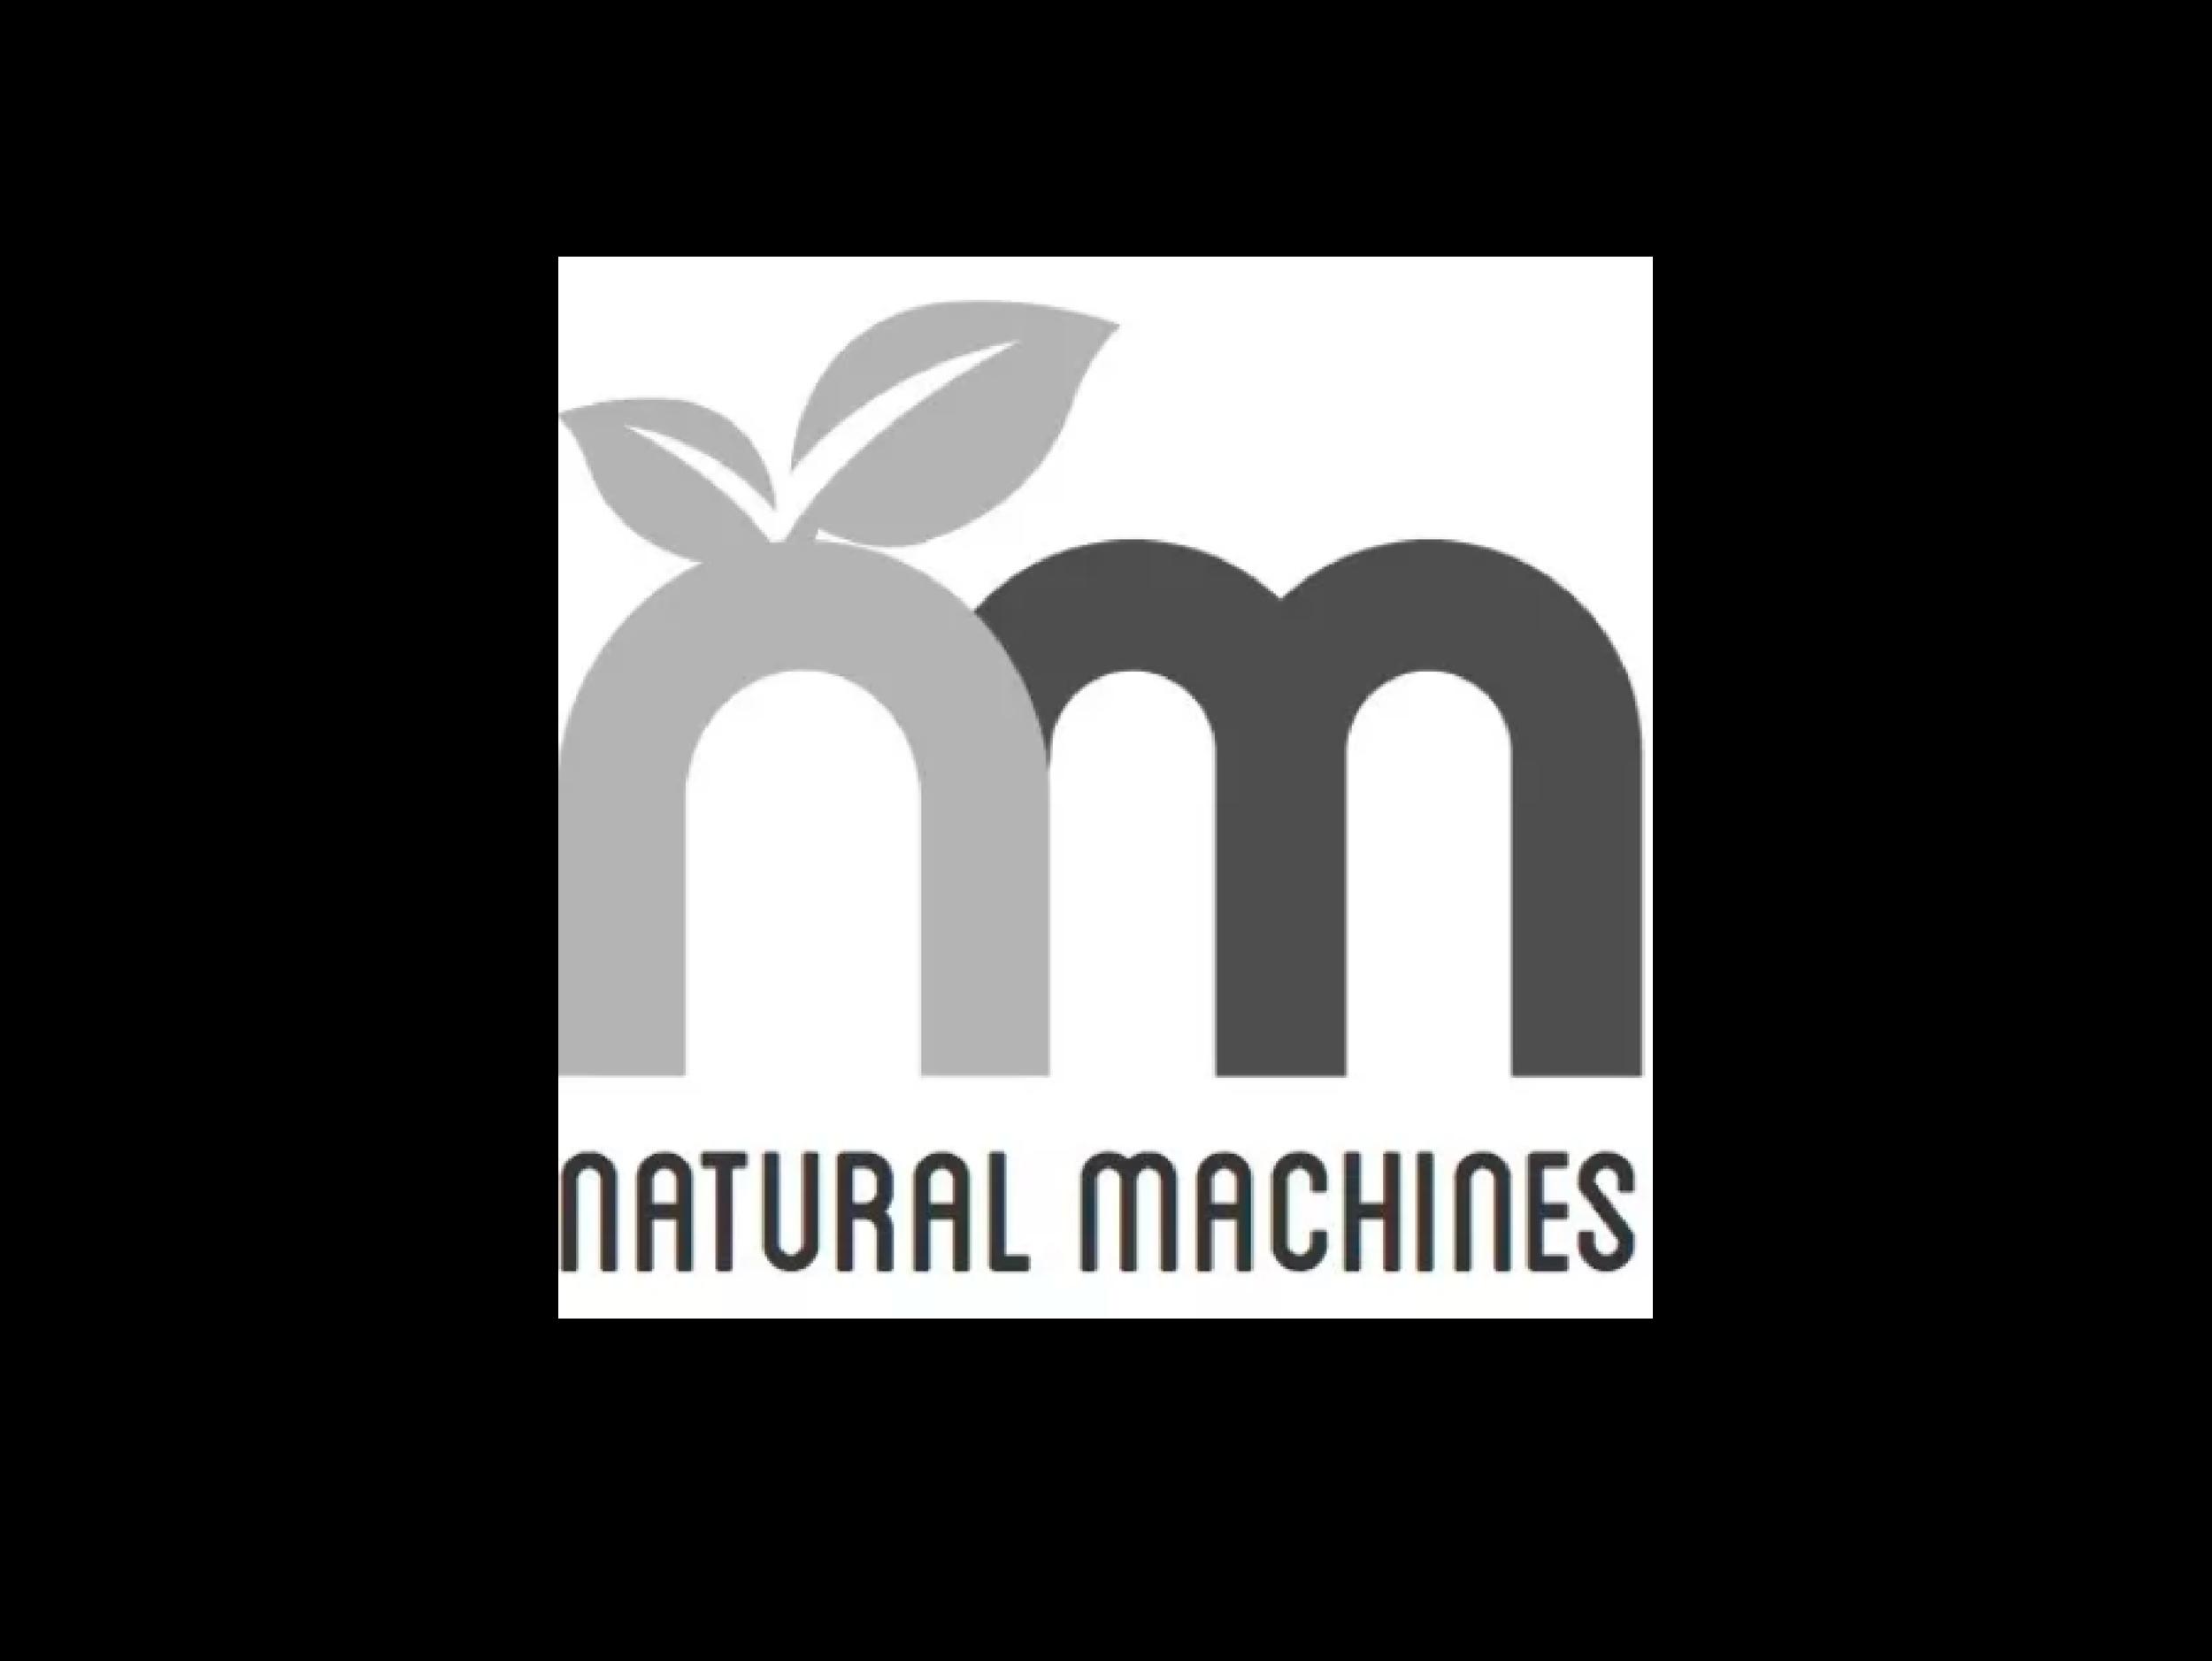 Natural Machines-01.PNG